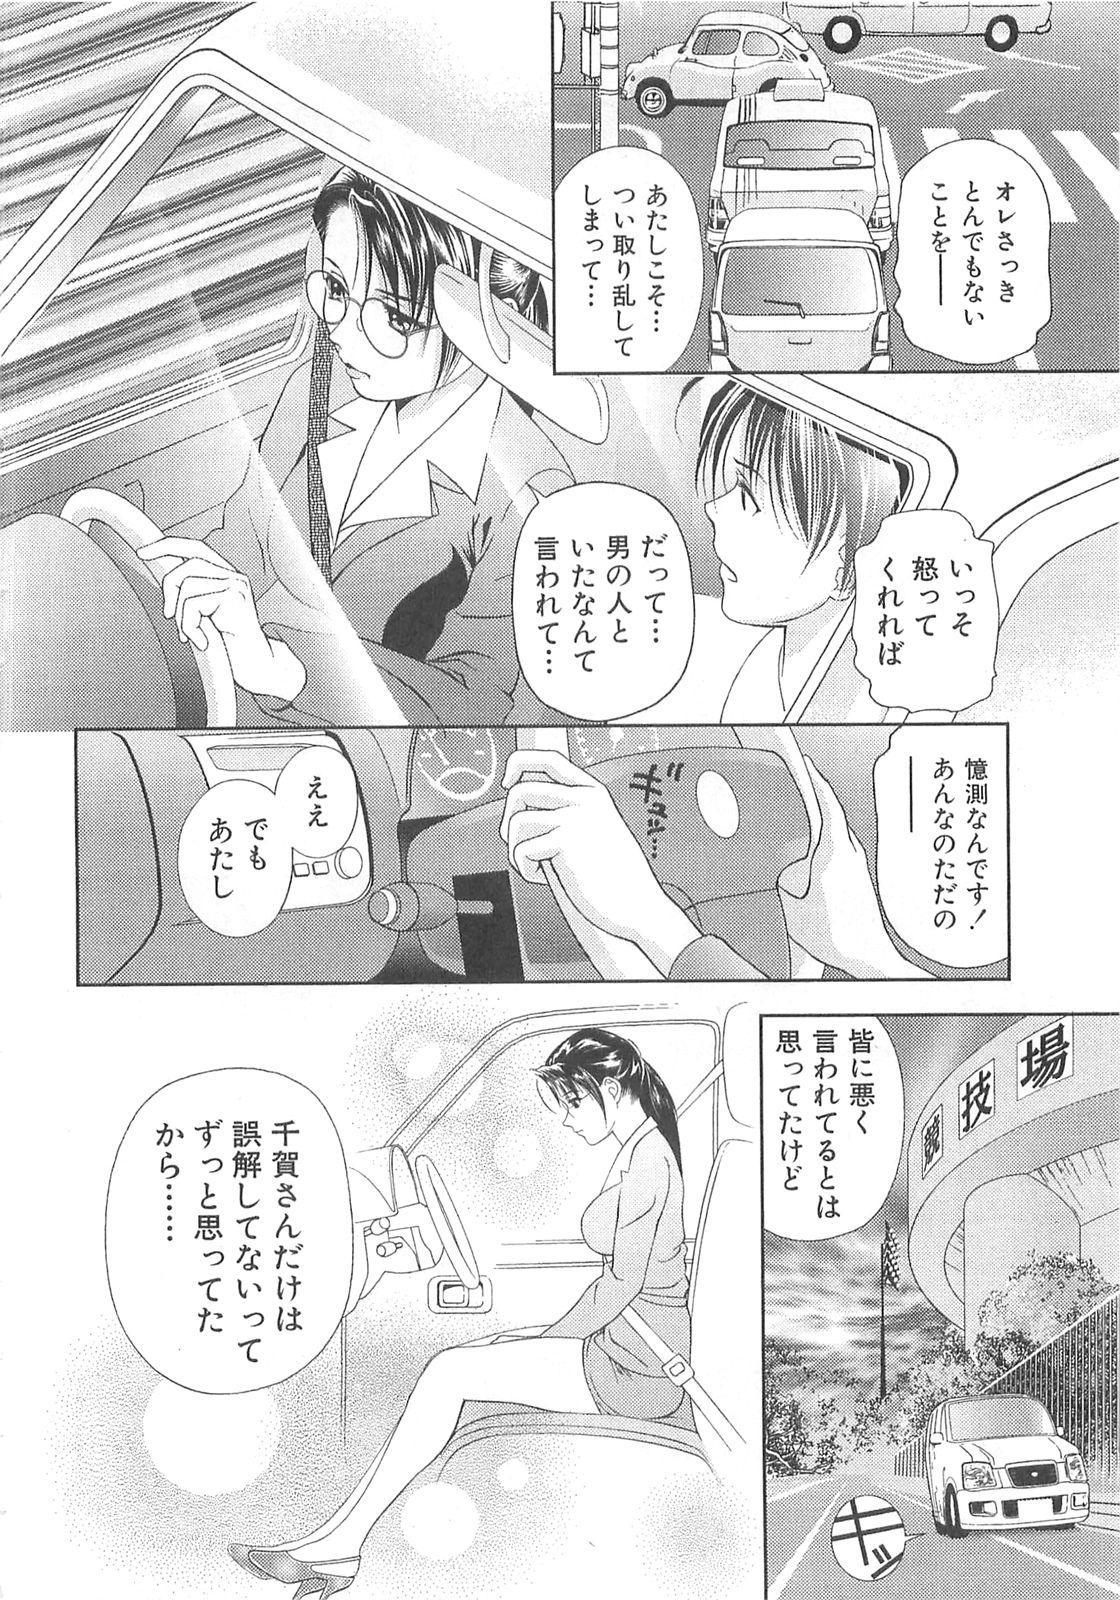 Tenshi no Kyuu - Angel's Pretty Hip 180